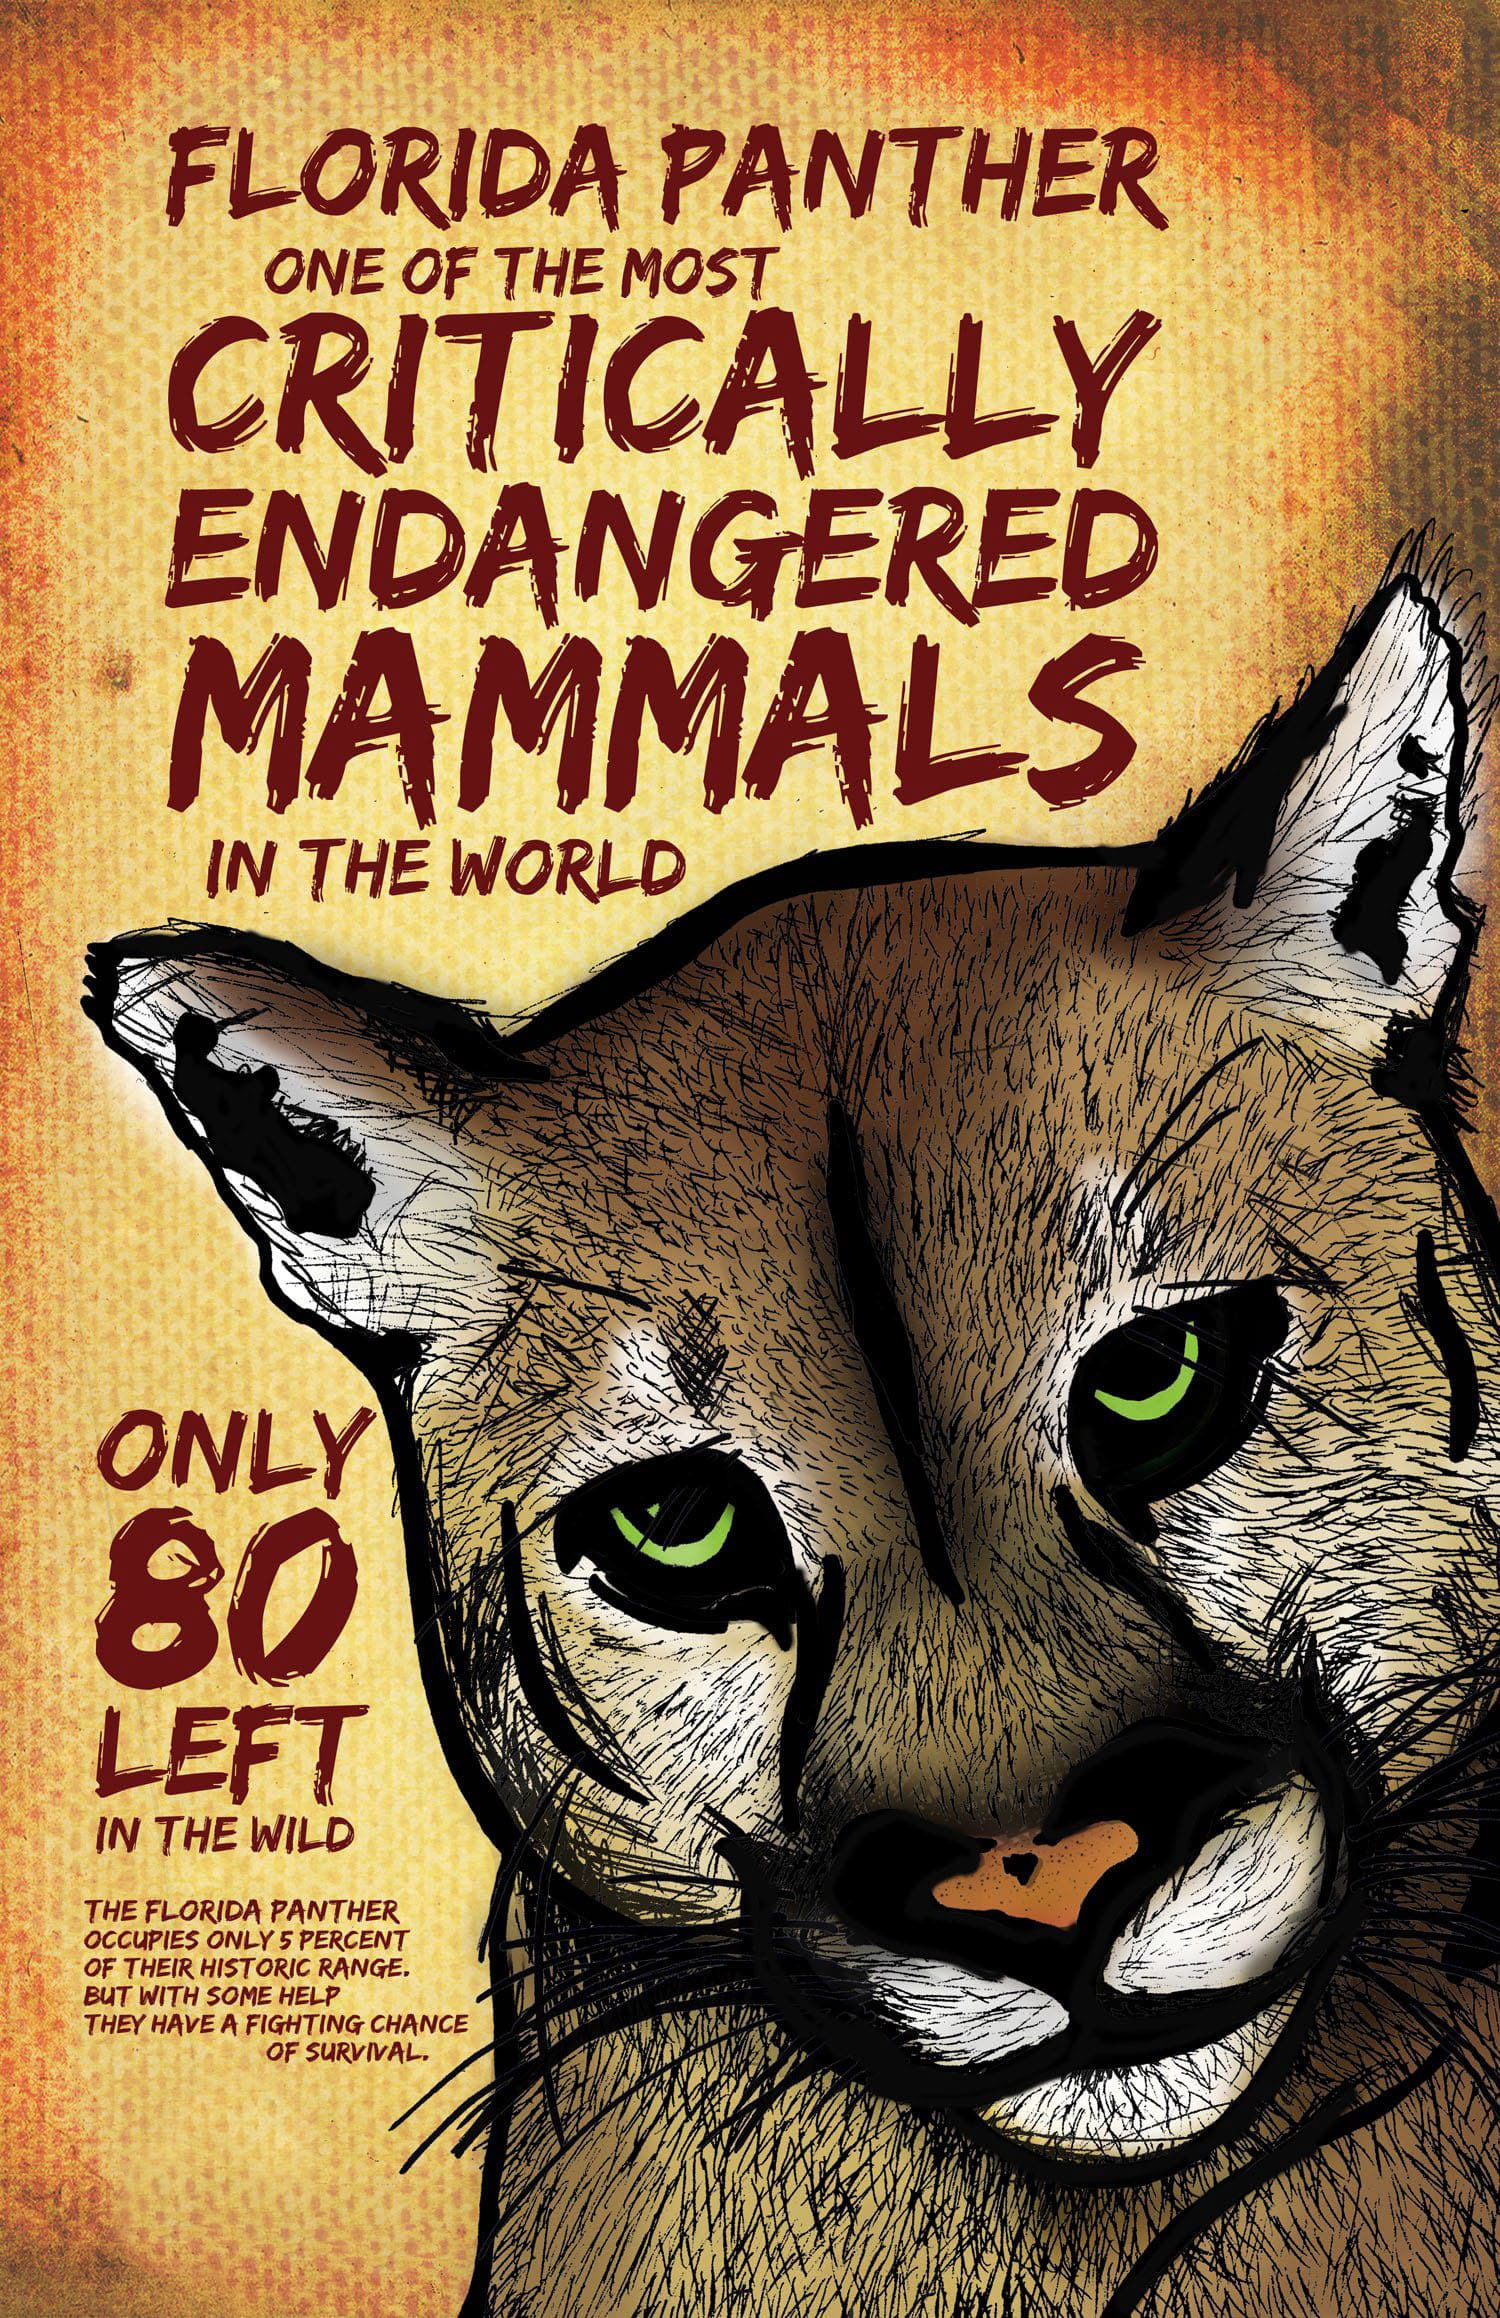 Endangered Animal Species Poster